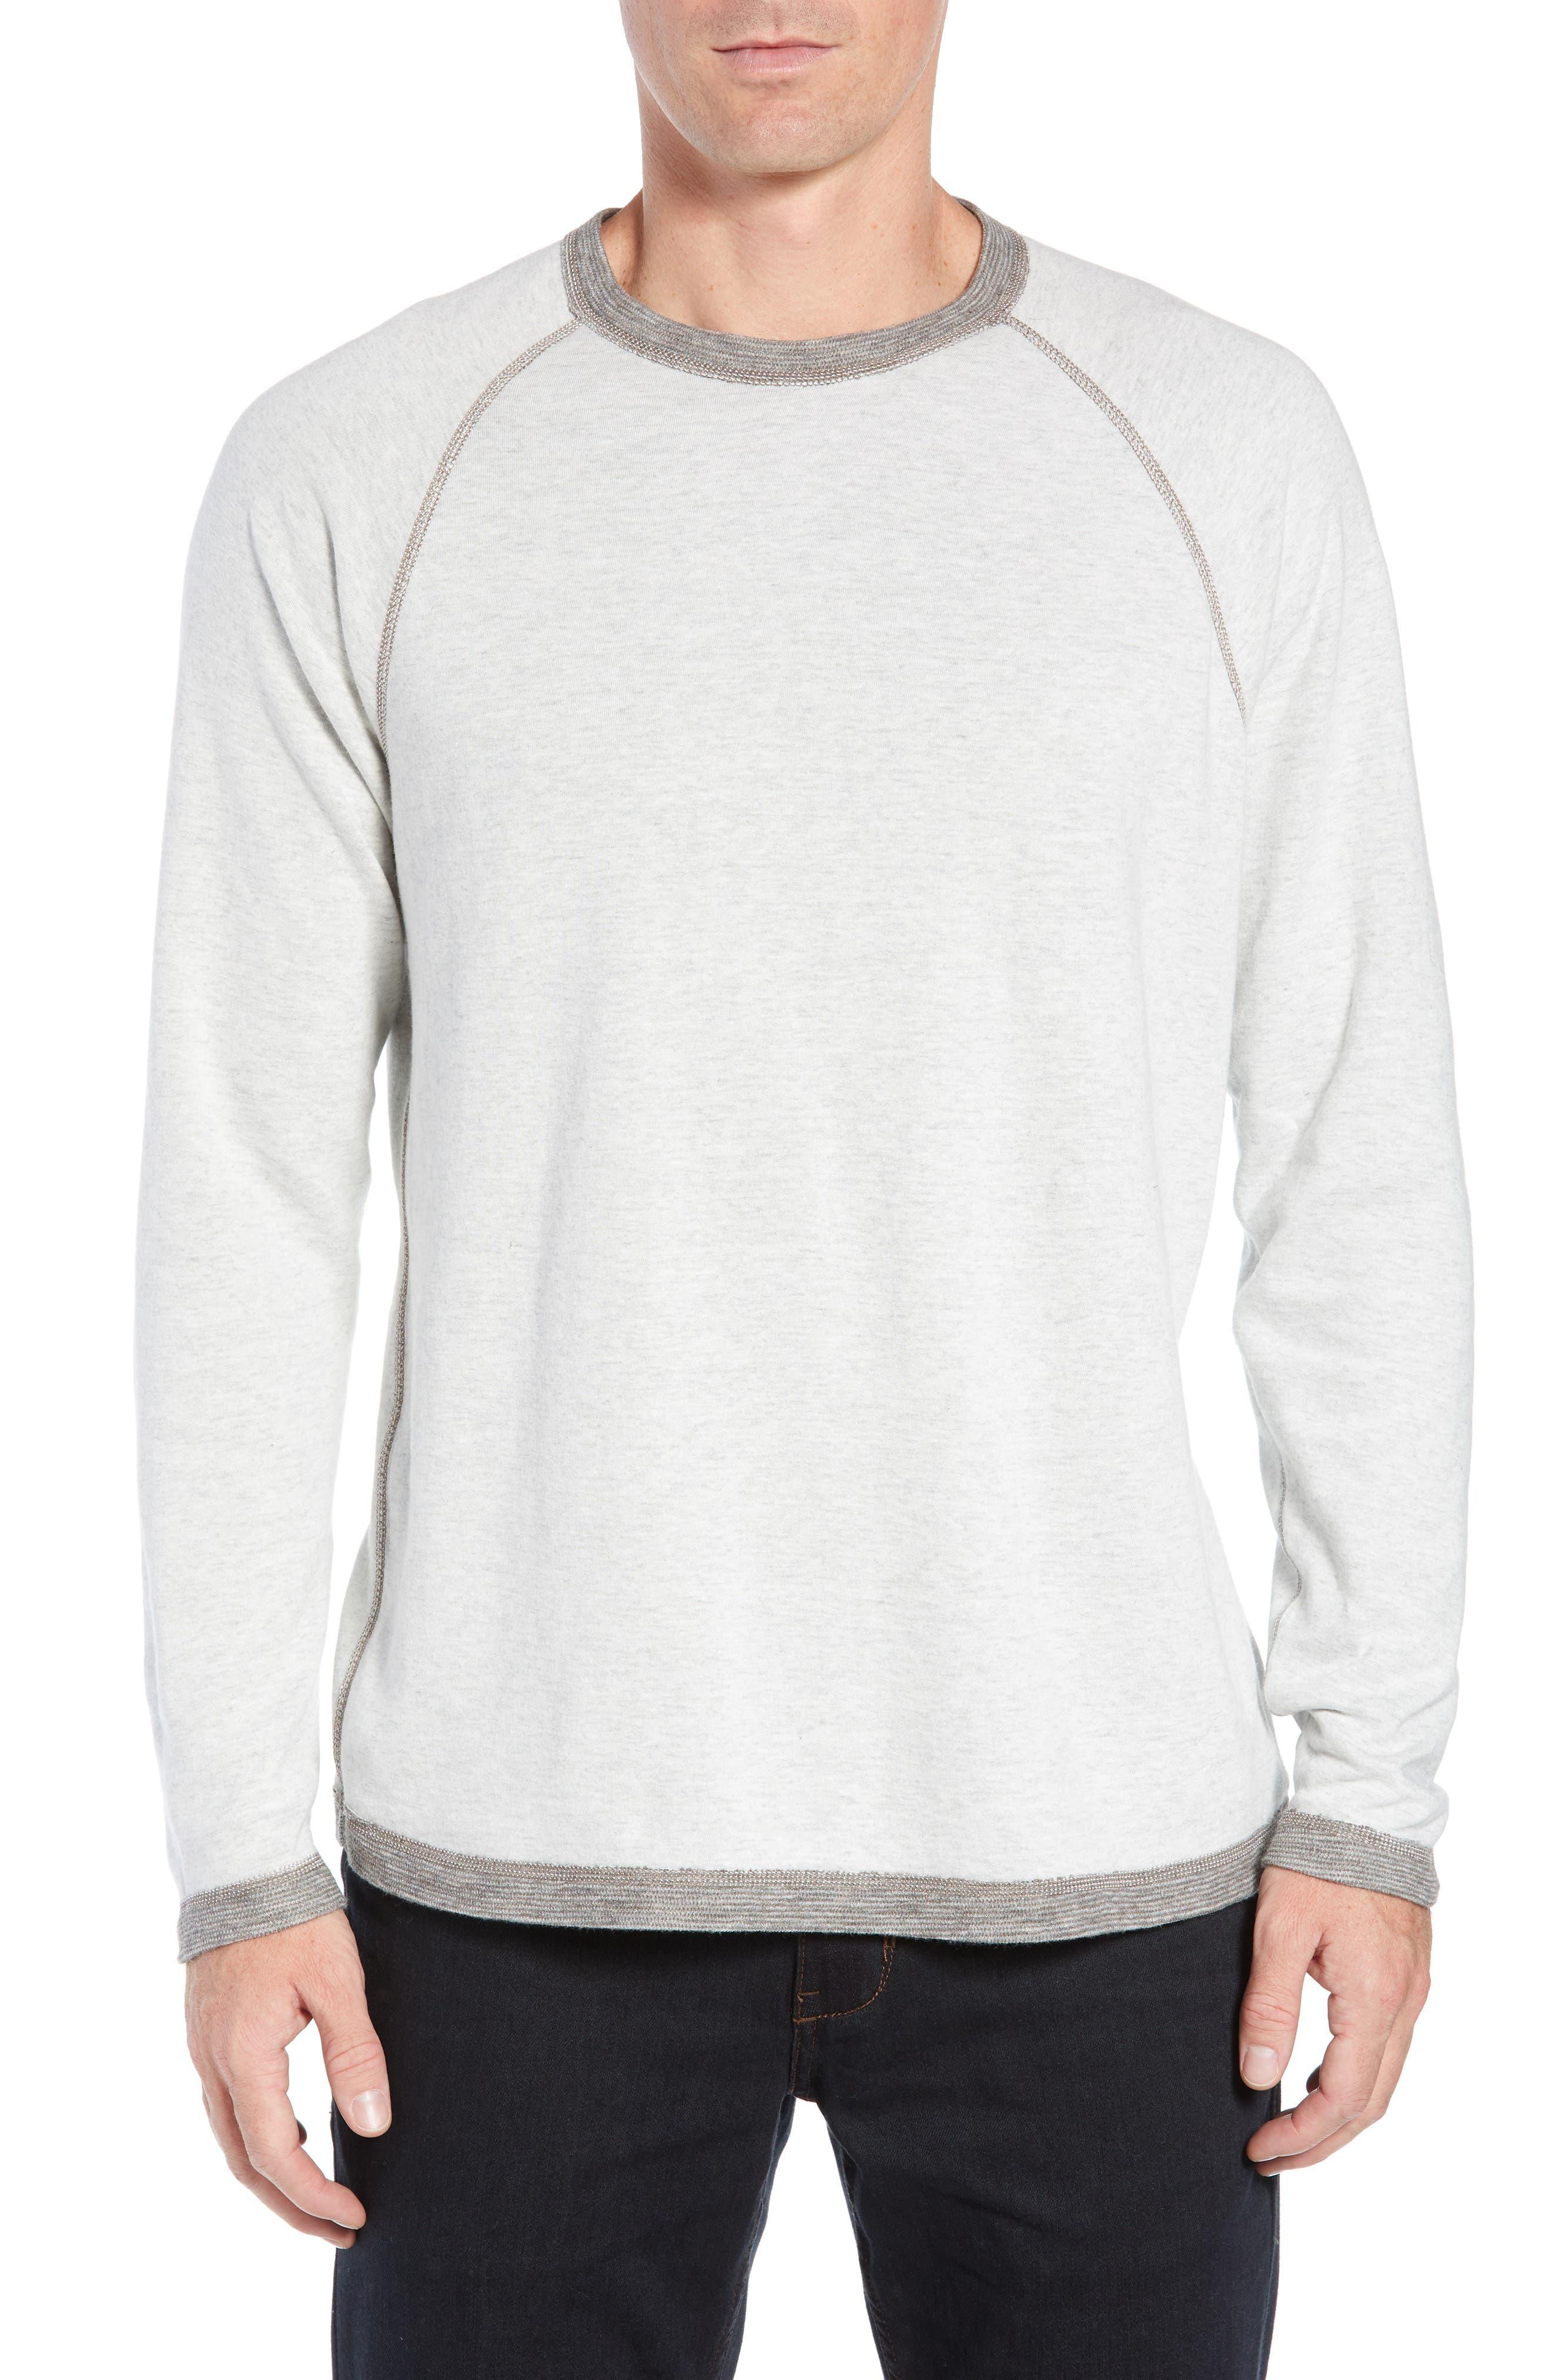 Fortuna Flip Regular Fit Shirt,                             Alternate thumbnail 2, color,                             TAUPE HEATHER